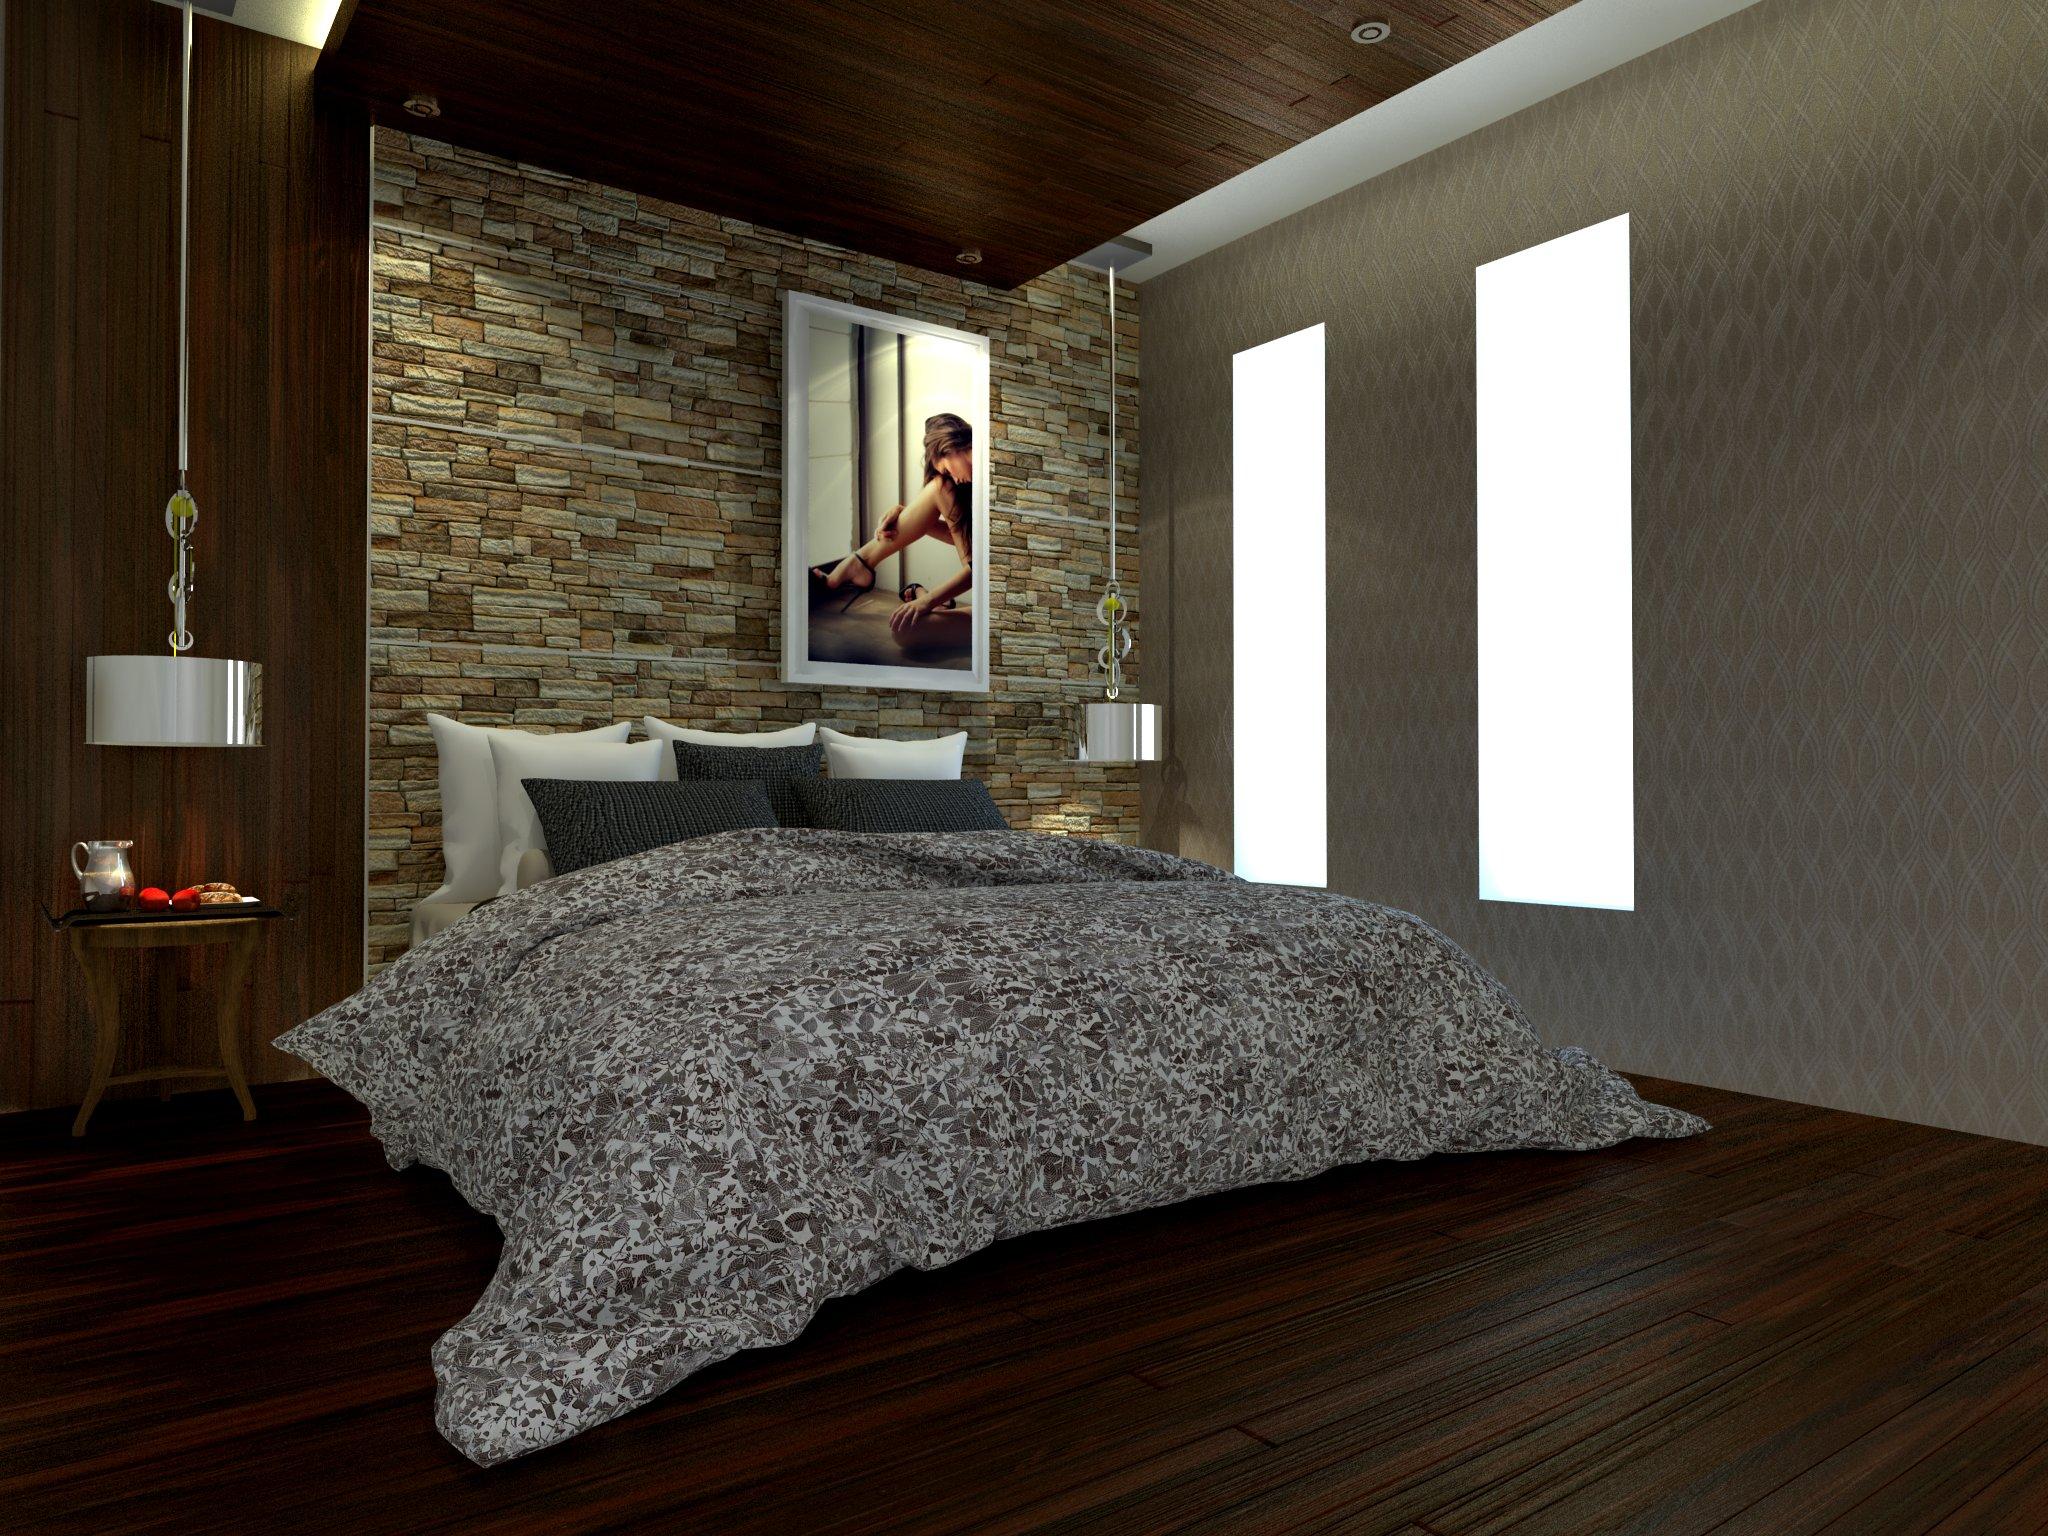 bedroom set interior design di jembatan besi, jakarta barat